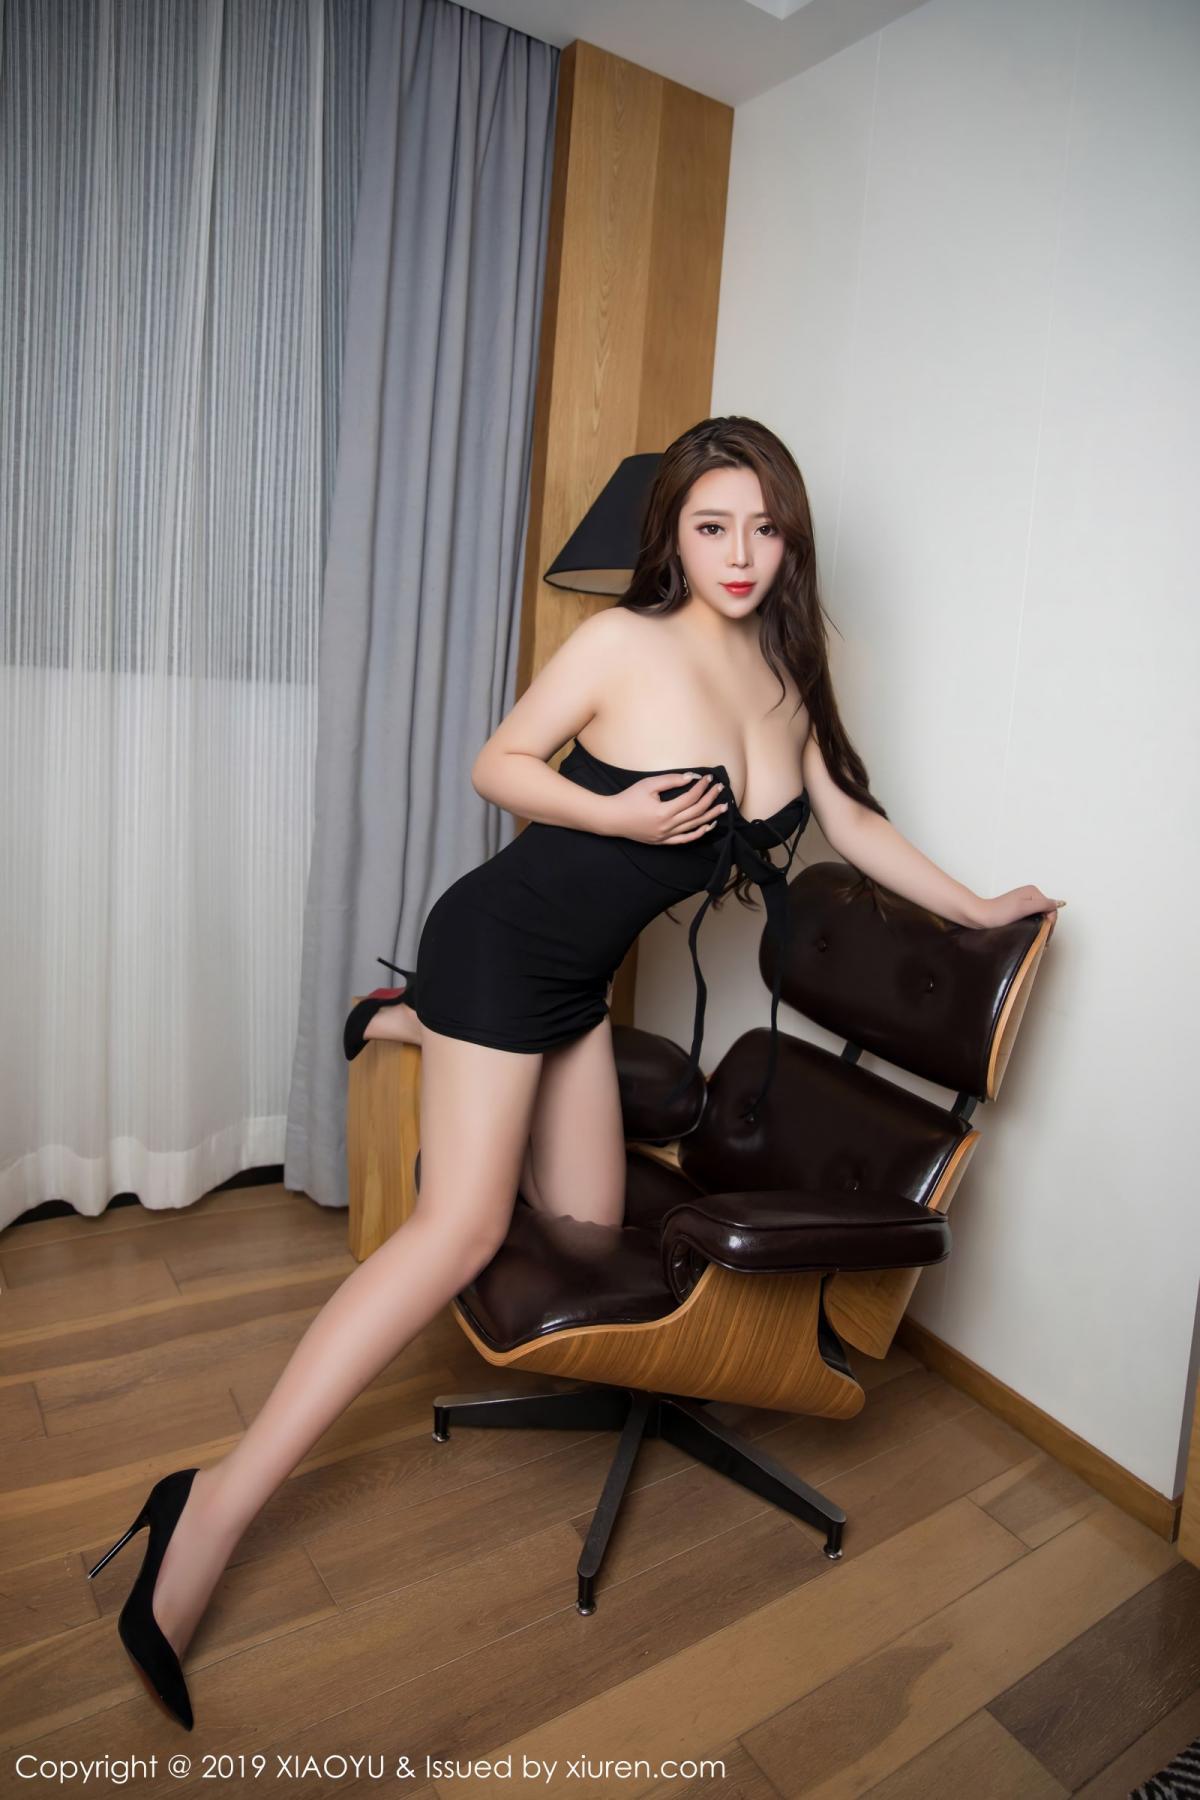 [XiaoYu] Vol.016 Miki Tu 3P, Miki Tu, Tall, XiaoYu